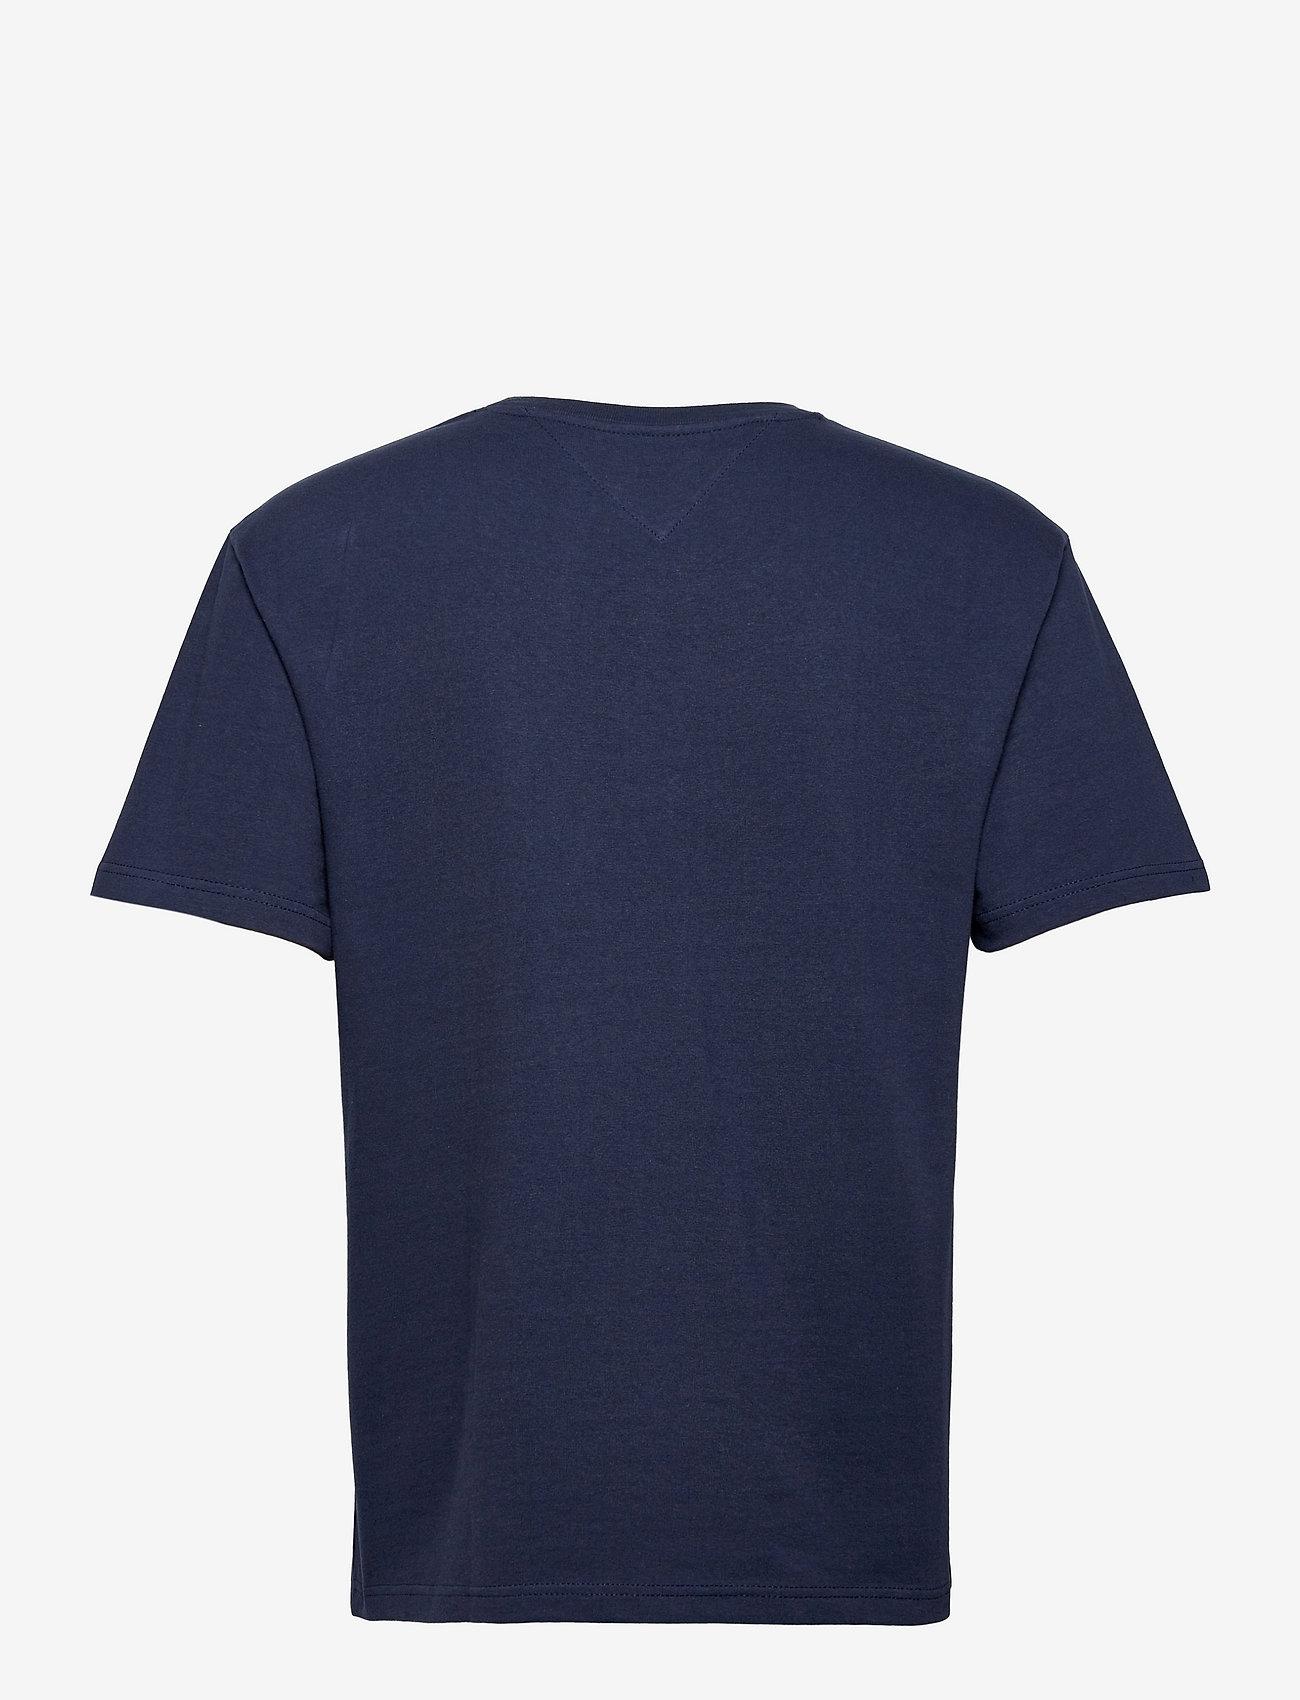 Tommy Jeans - TJM TOMMY BADGE TEE - kortärmade t-shirts - twilight navy - 1